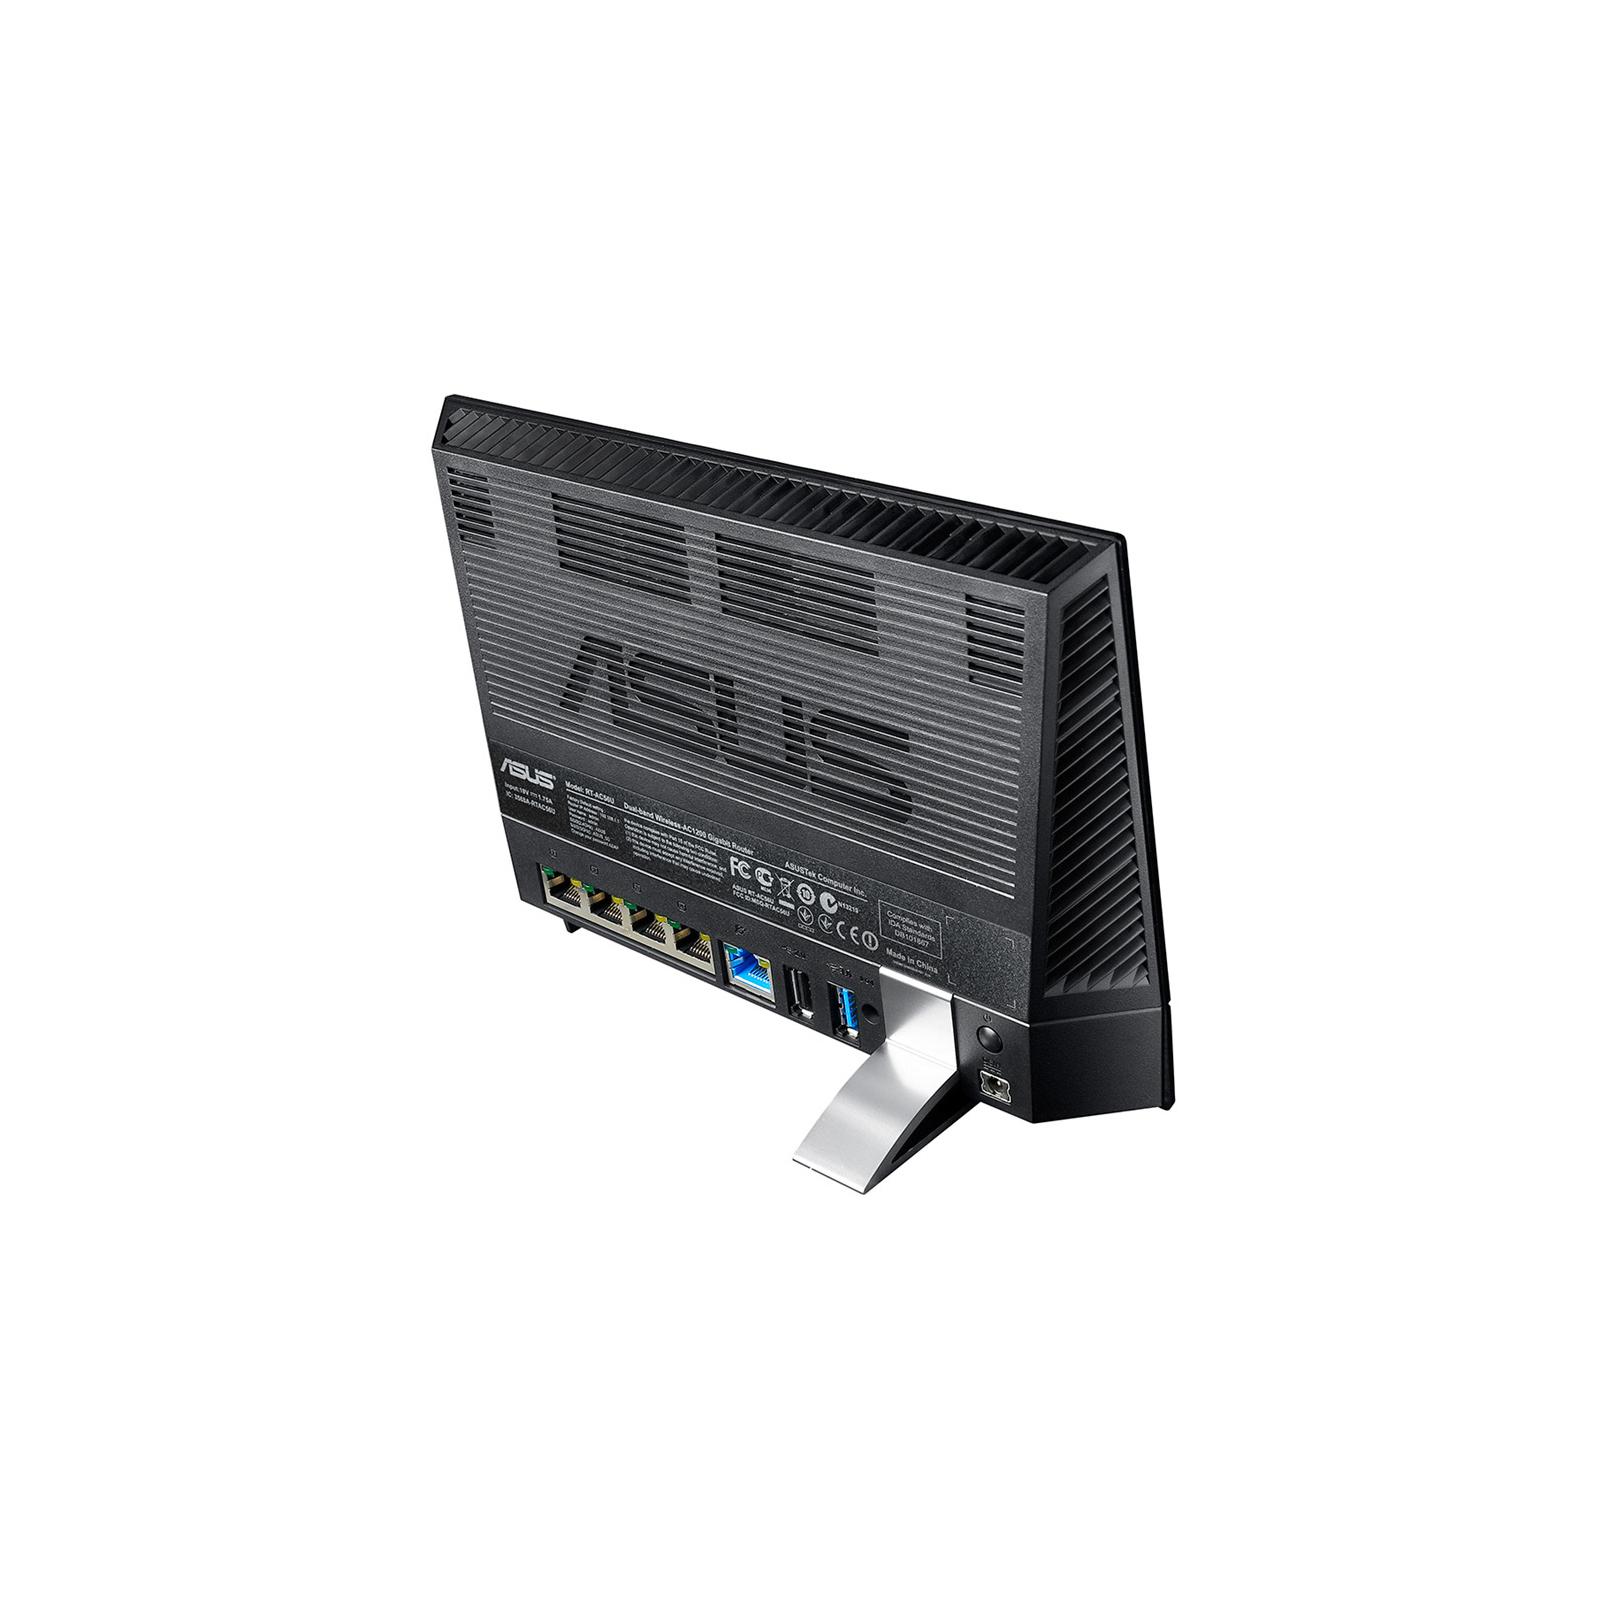 Маршрутизатор ASUS RT-AC56U изображение 4